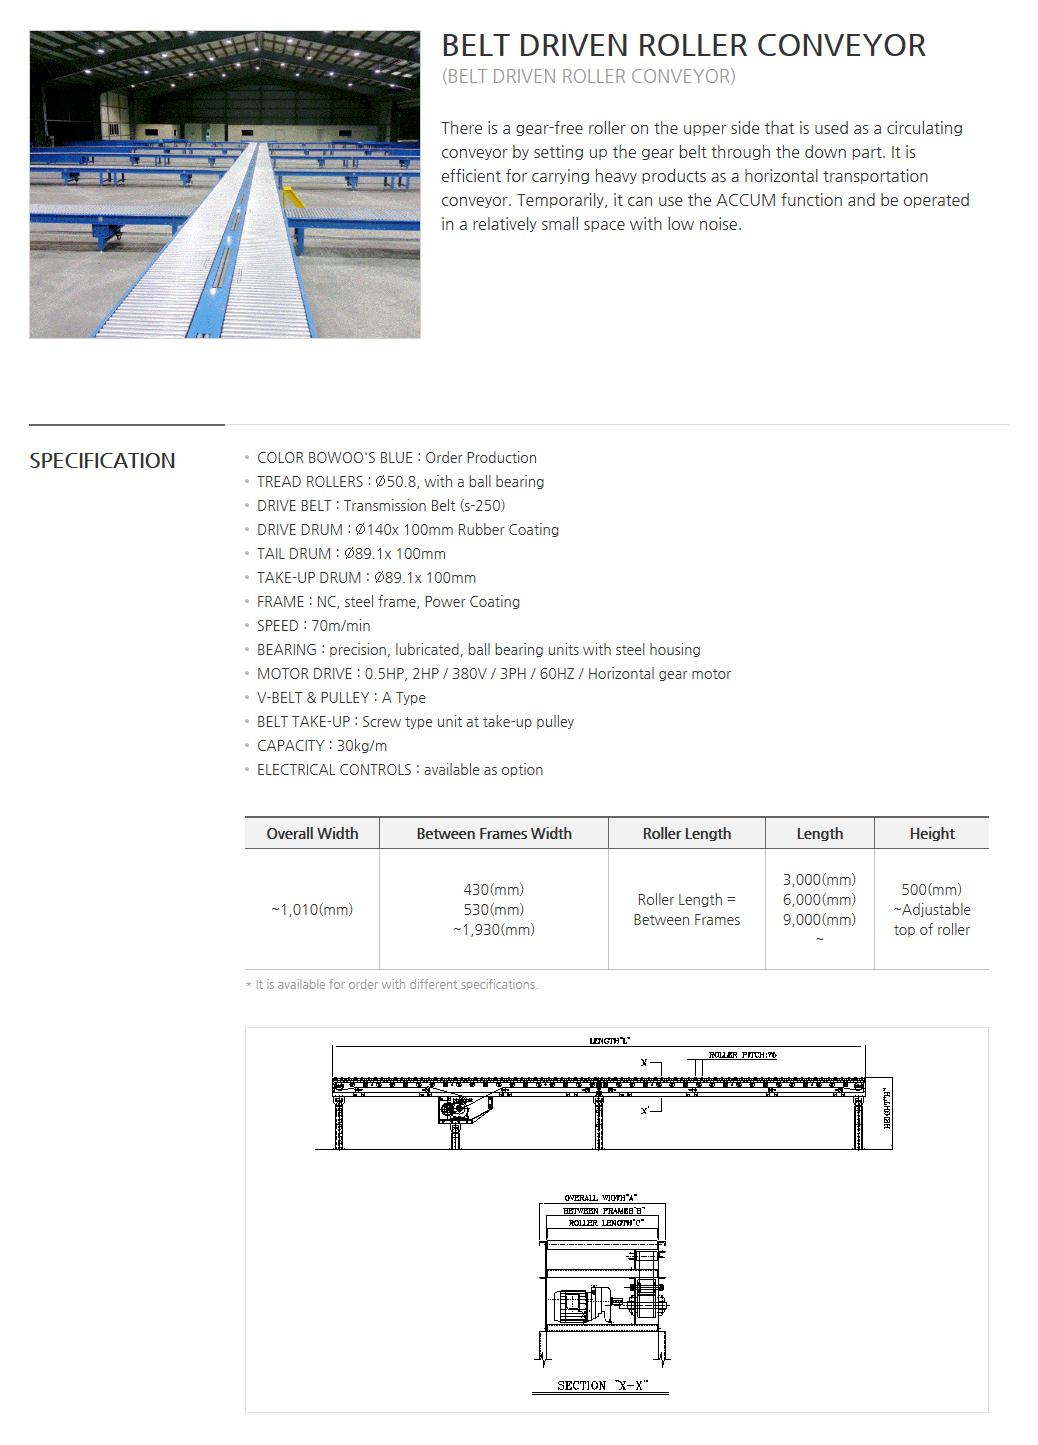 BOWOOSYSTEM Power Conveyor : Belt Driven Roller Conveyor